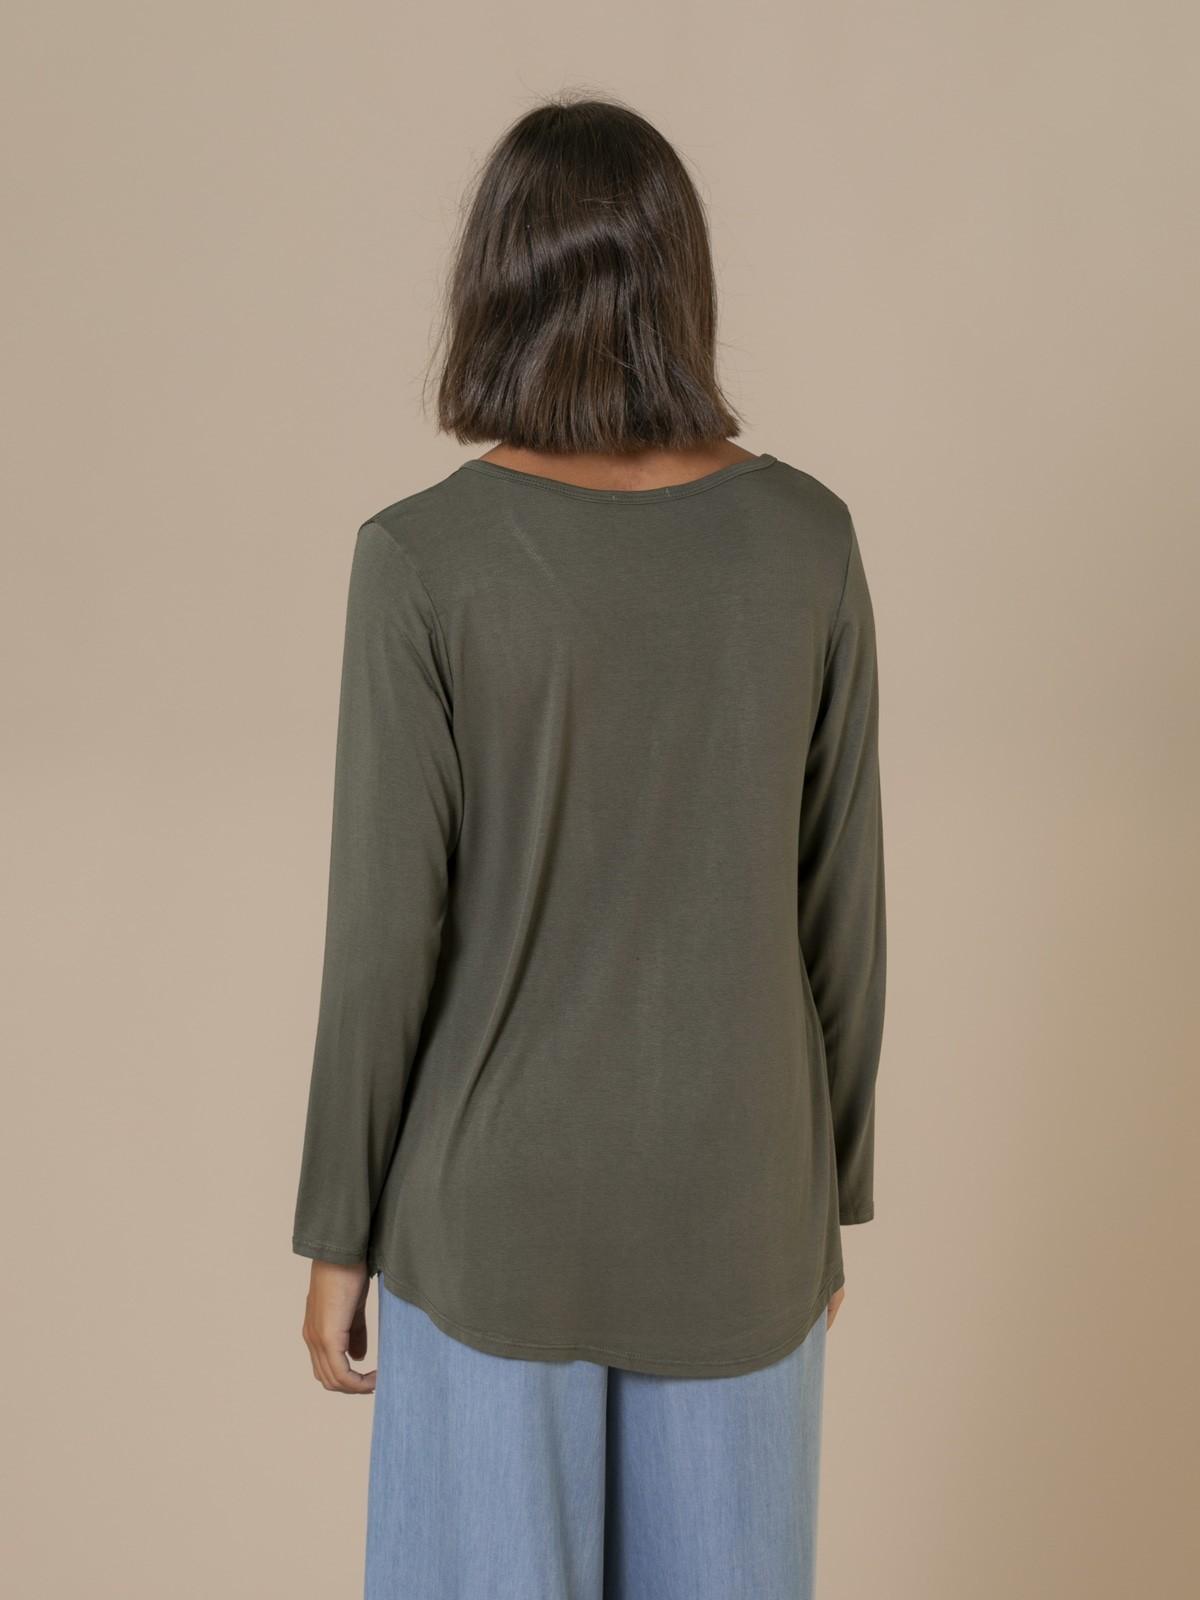 Camiseta mujer fluida manga larga Caqui